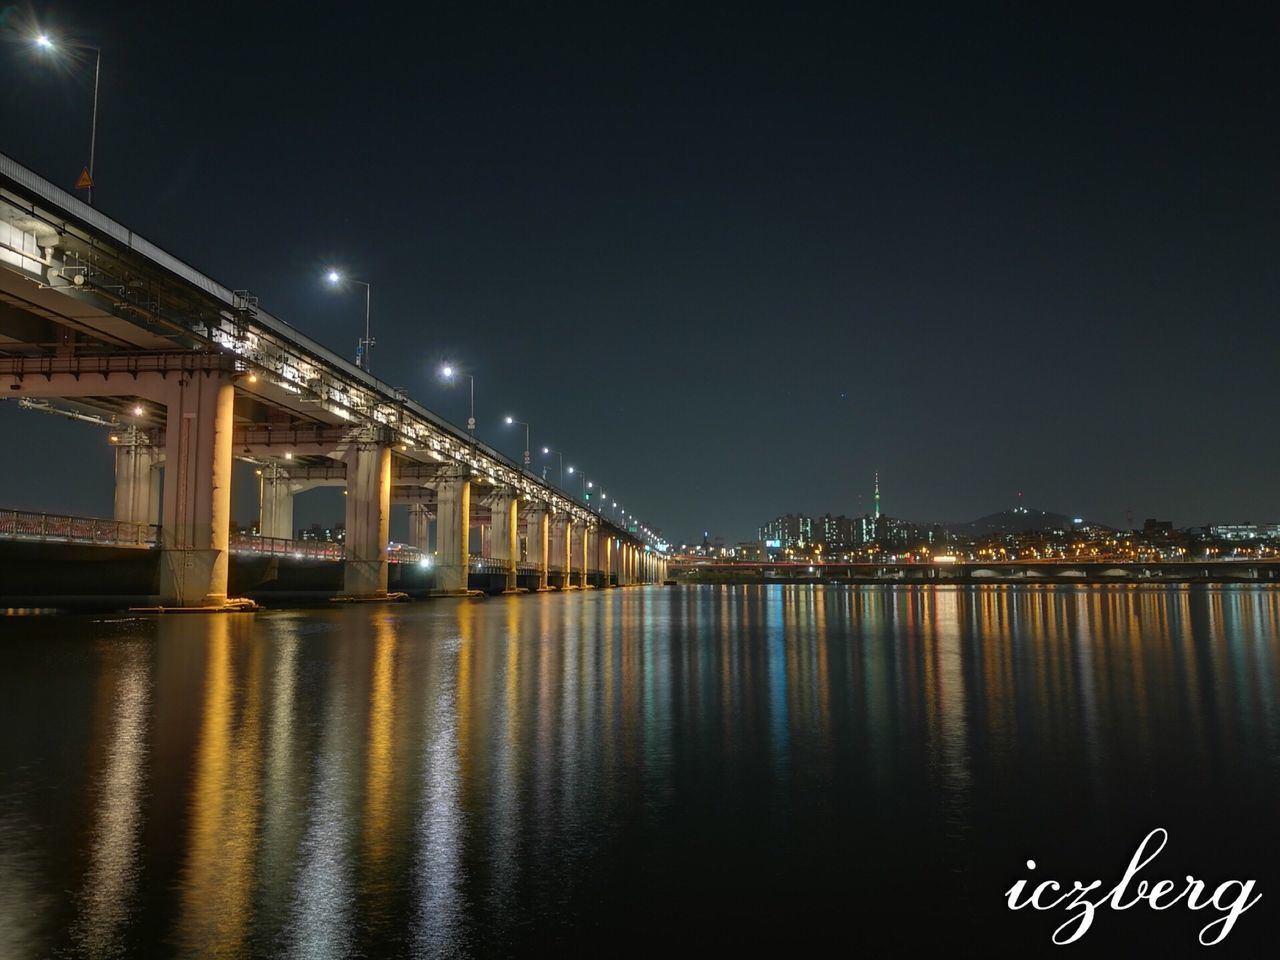 Banpo bridge Banpobridge Banpo Bridge Banpodaegyo Seoul South Korea River River View Reflect Reflectivelight